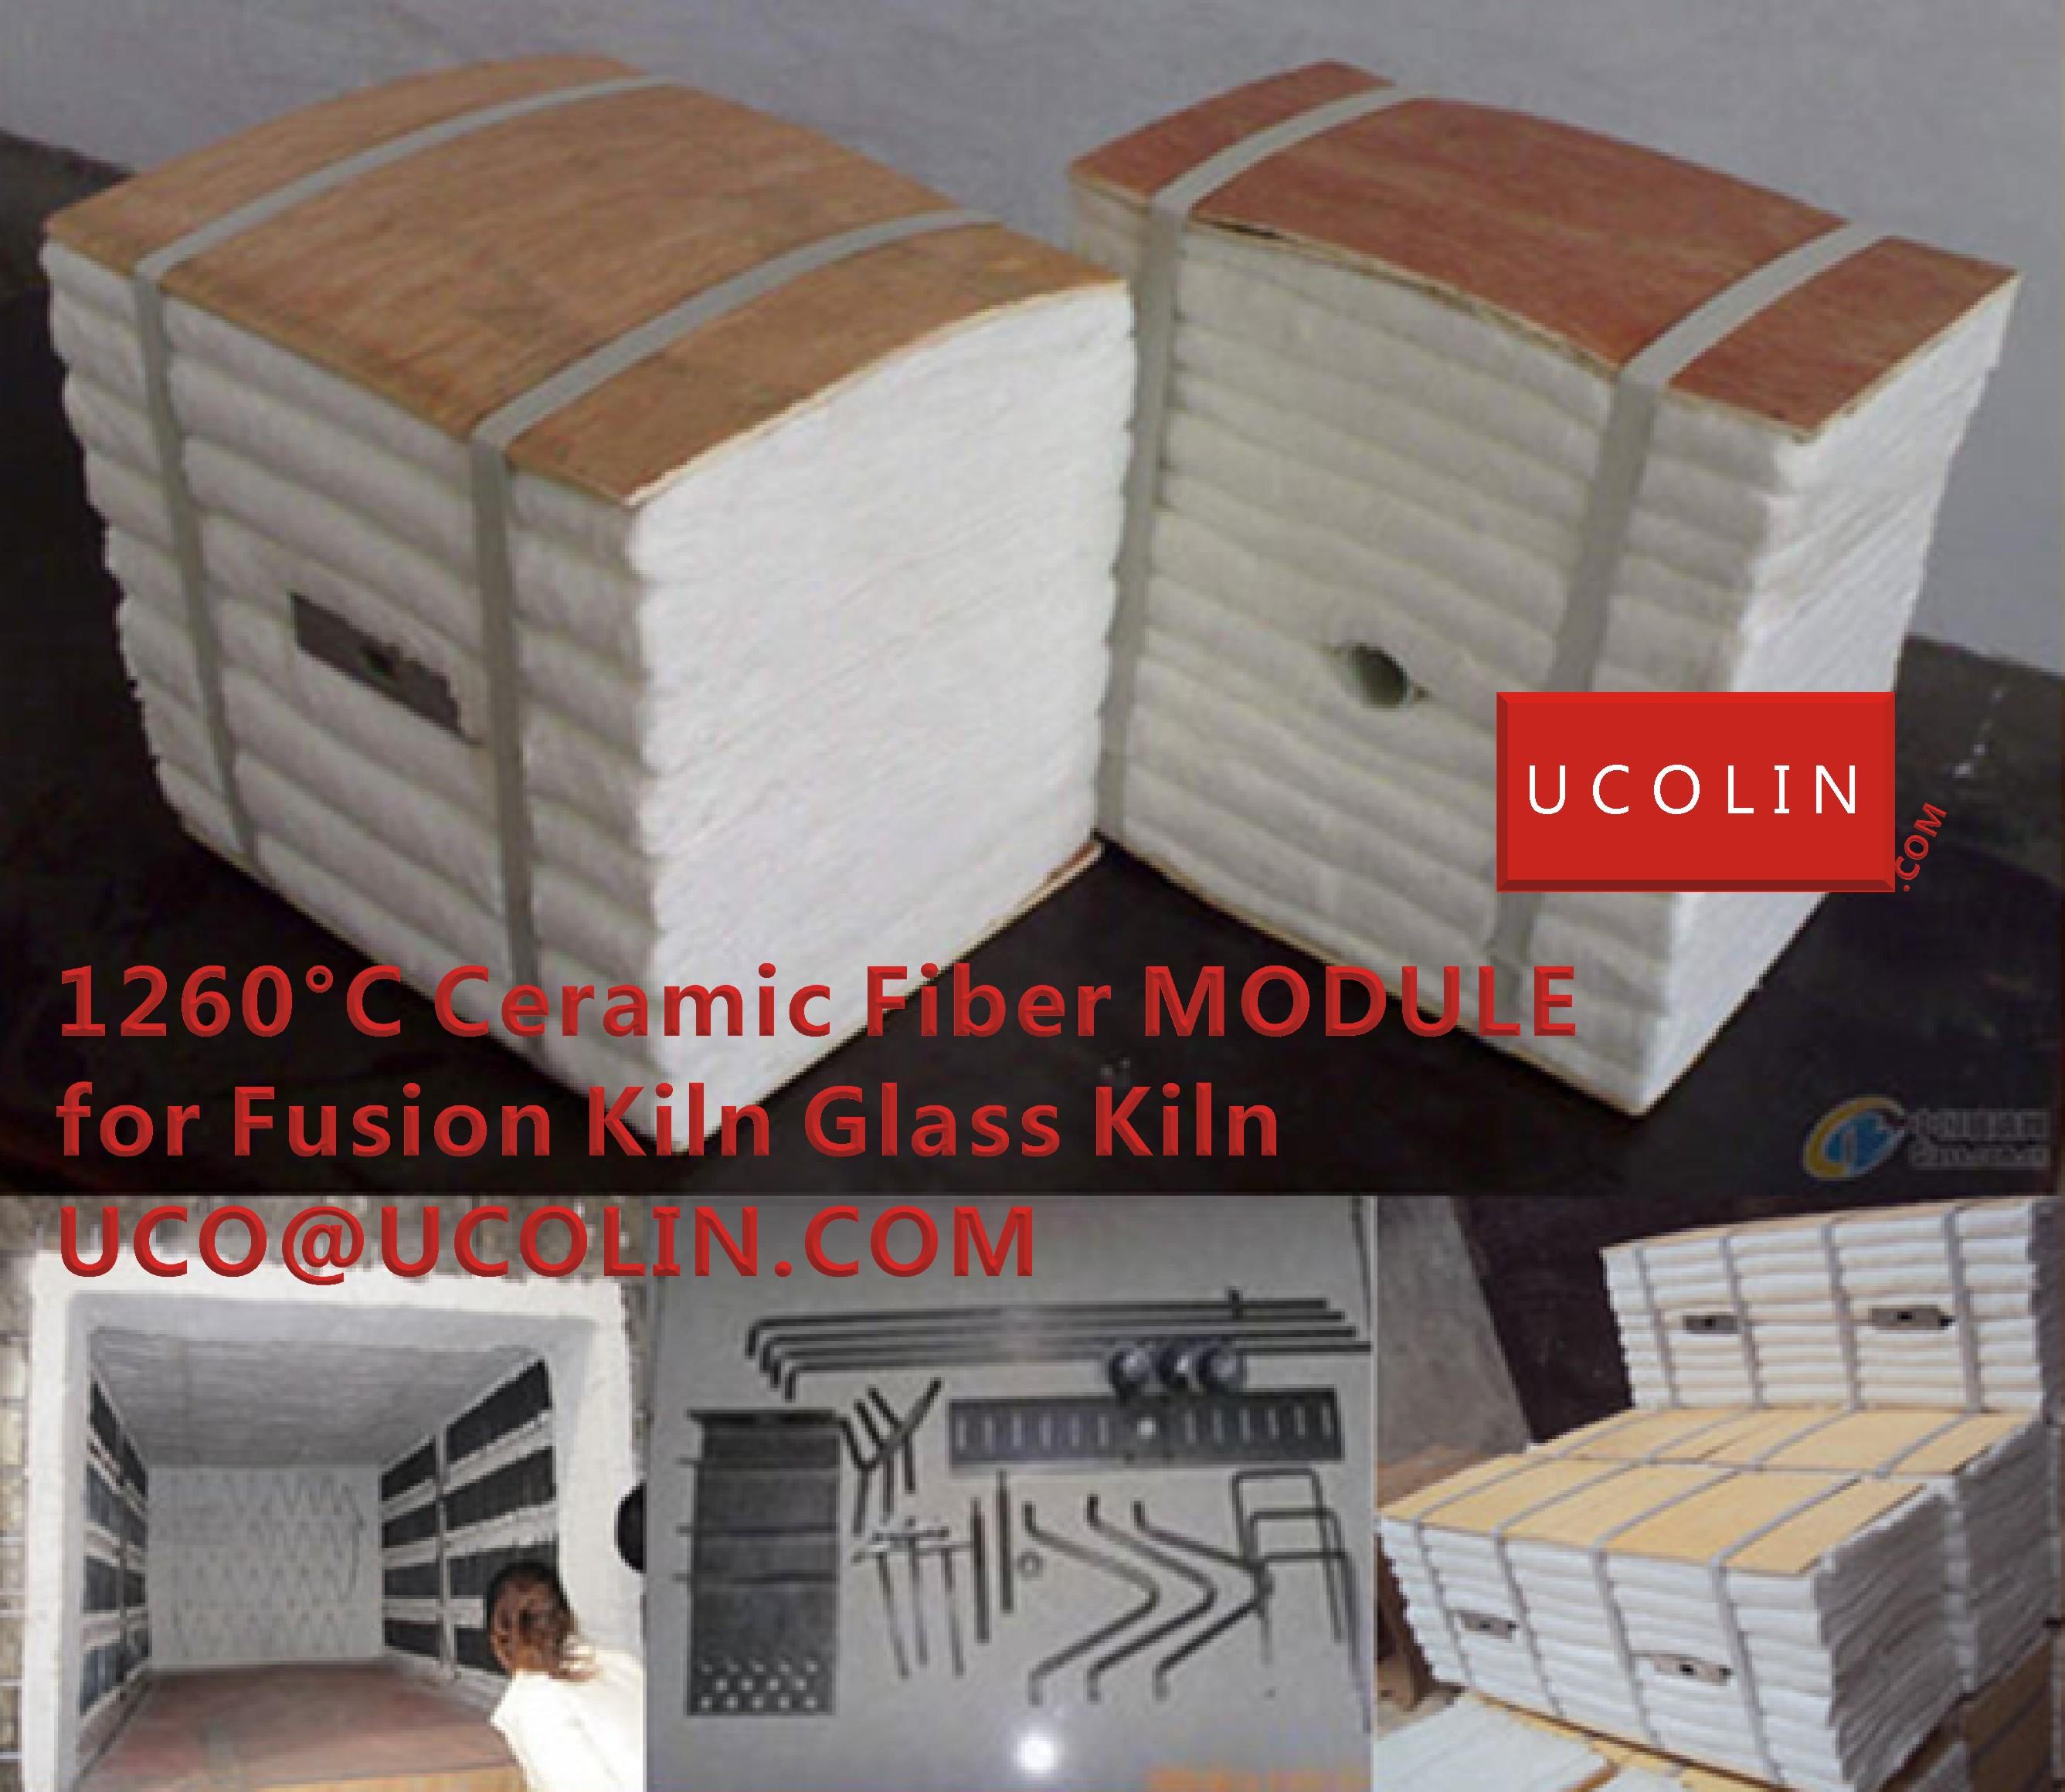 1260°C Ceramic Fiber MODULE for Fusion Kiln Glass Kiln